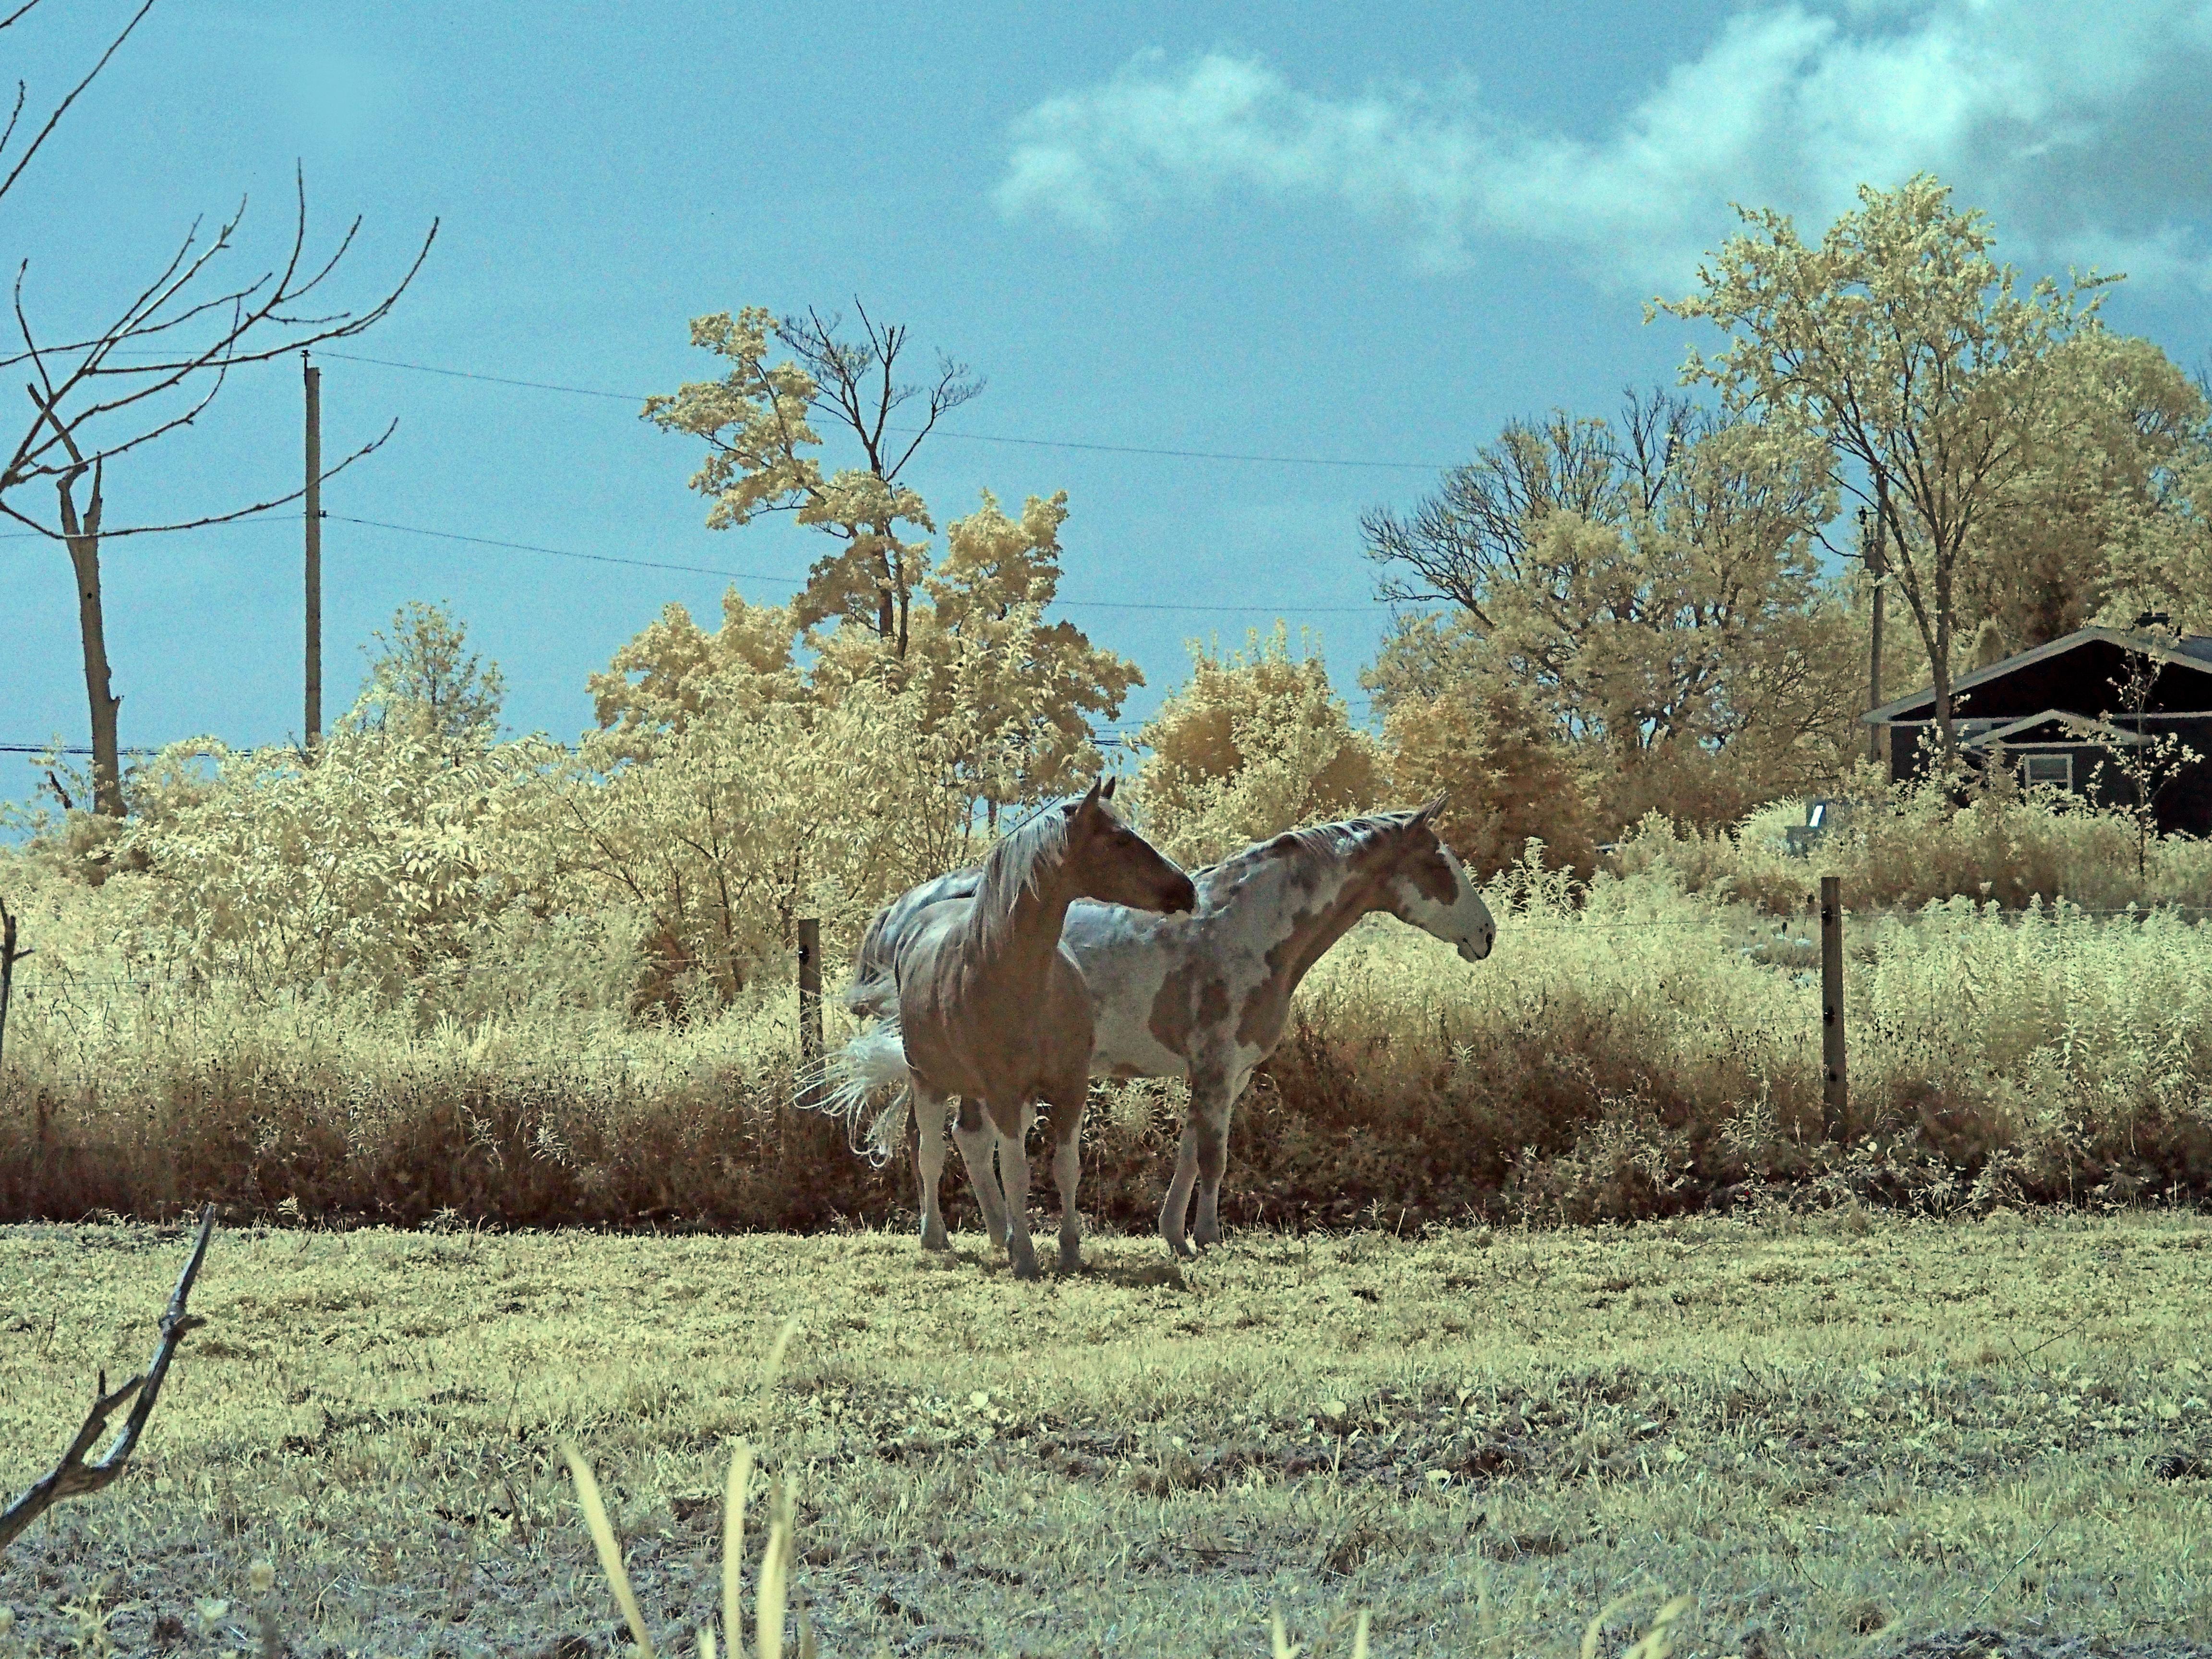 Paint horses listening